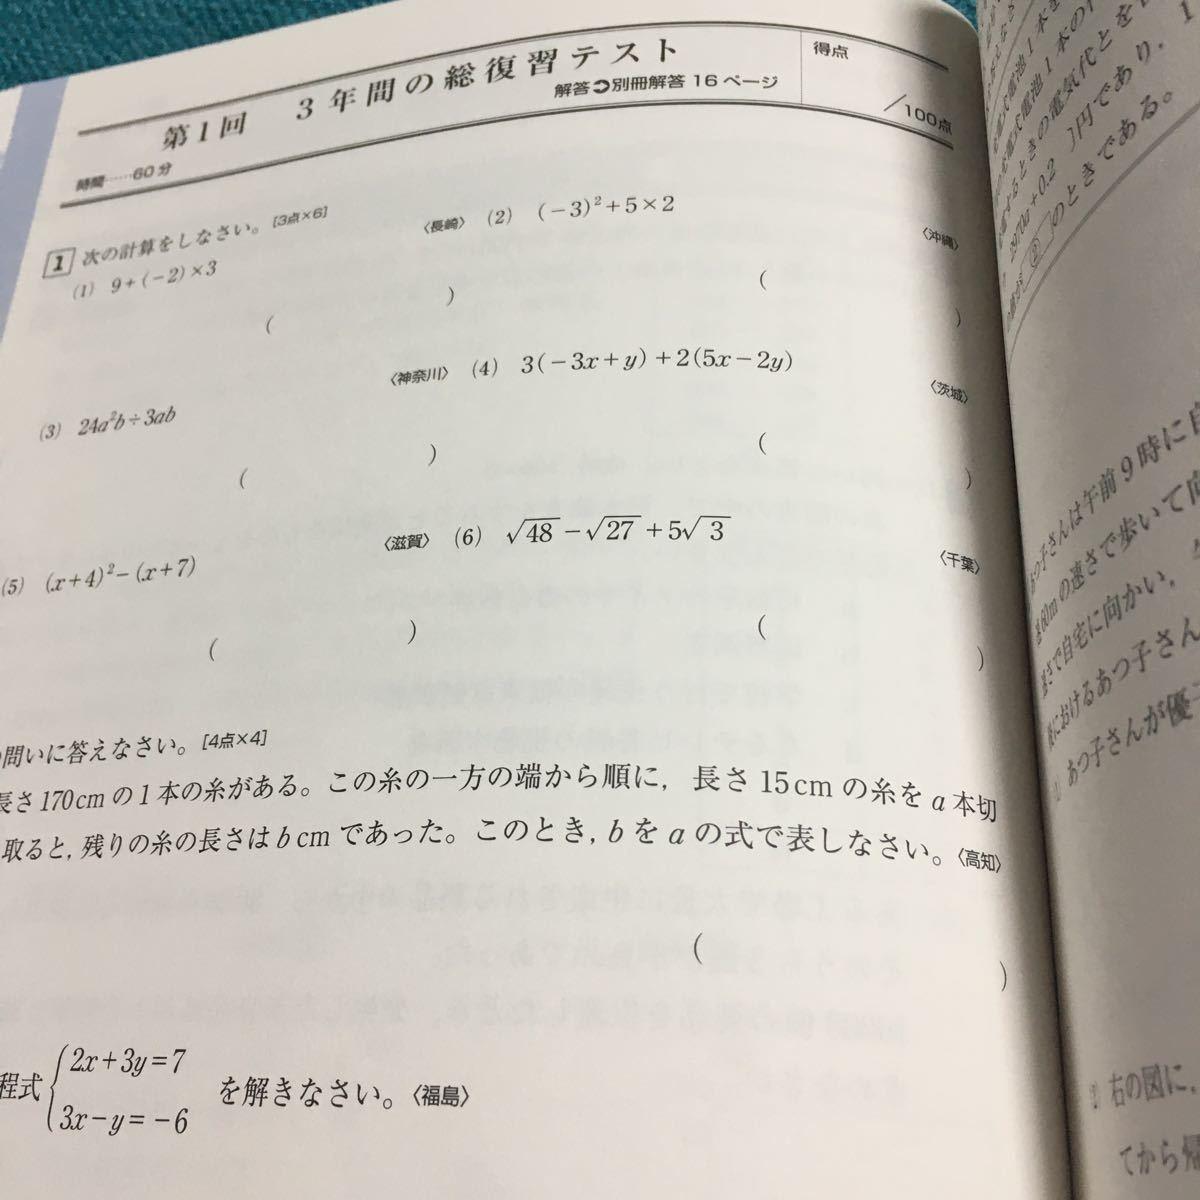 ★14日間スピード完成! 高校入試 中学3年間の総復習 数学 問題集 旺文社★